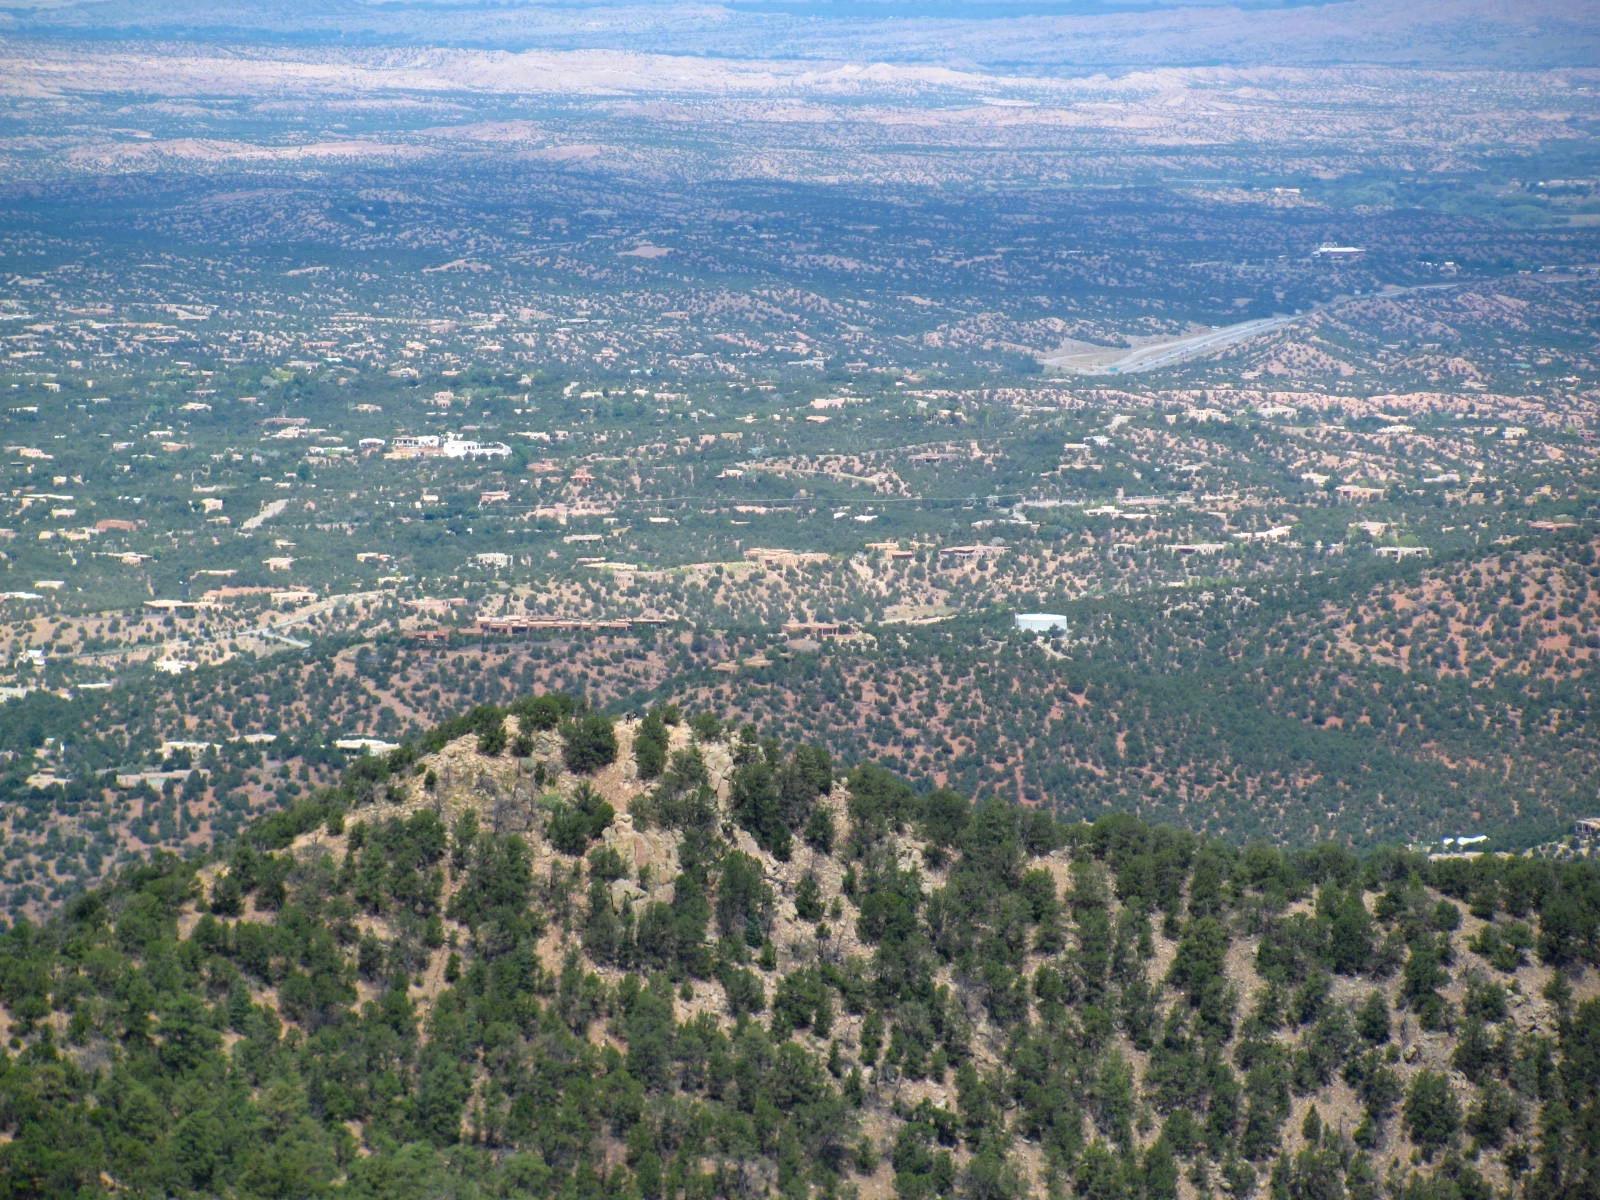 The view from Atalaya Mountain over Santa Fe, New Mexico.